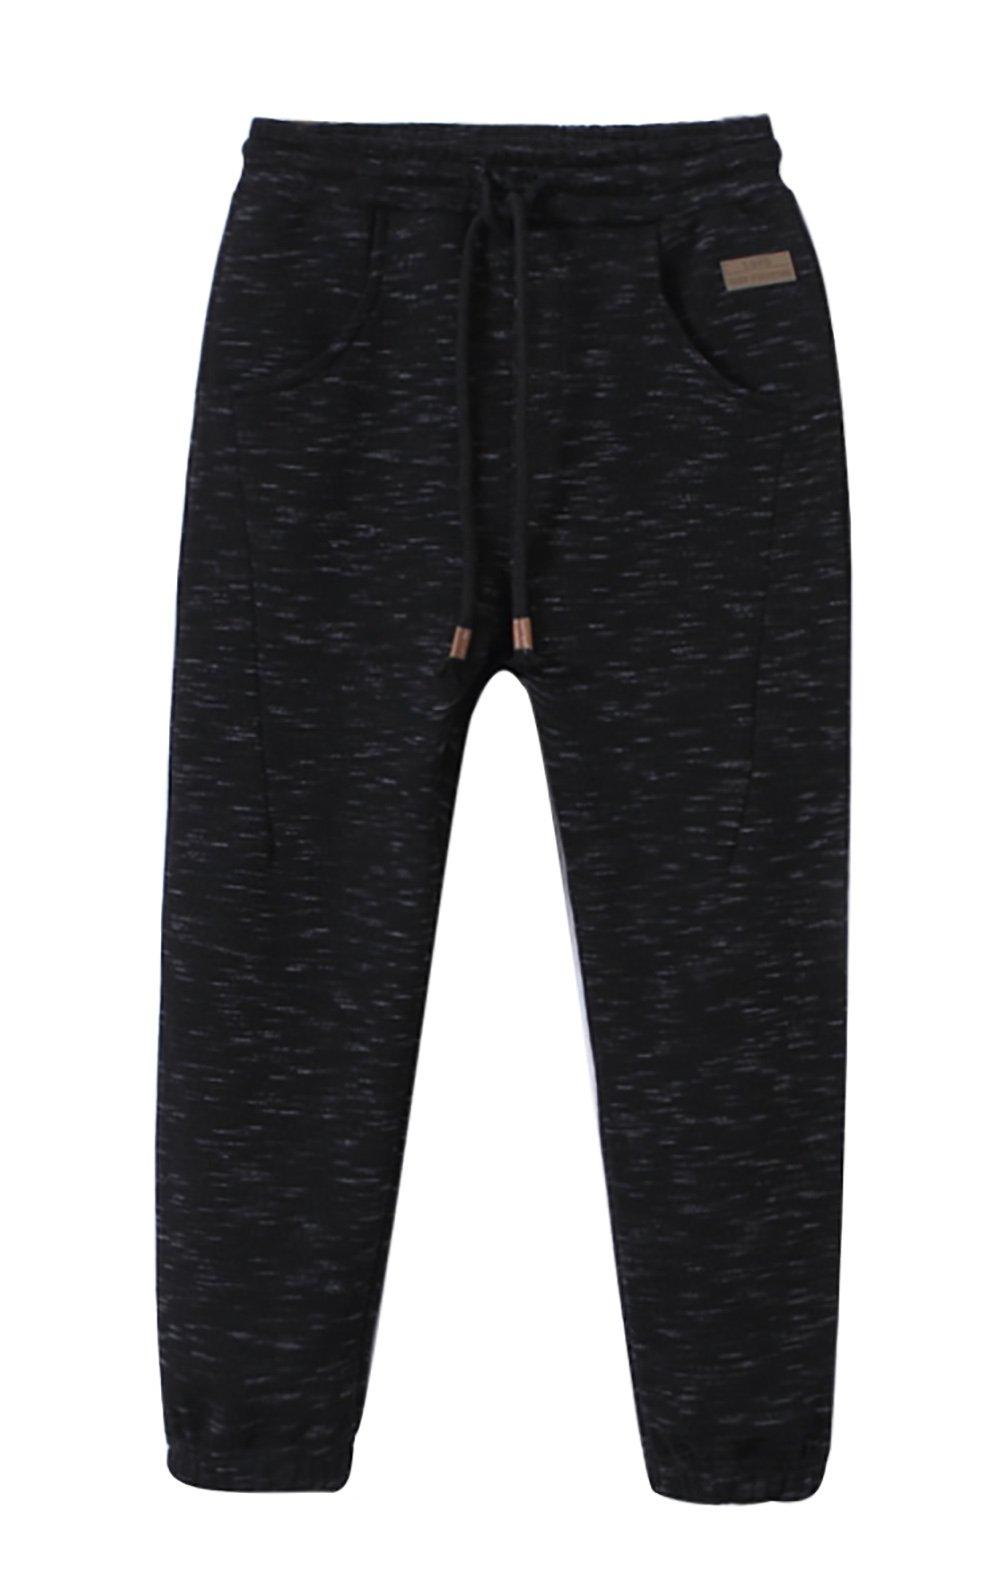 Zegoo Boy's Pull On Black Jogger Pants Slim Fit Skinny Running Trousers